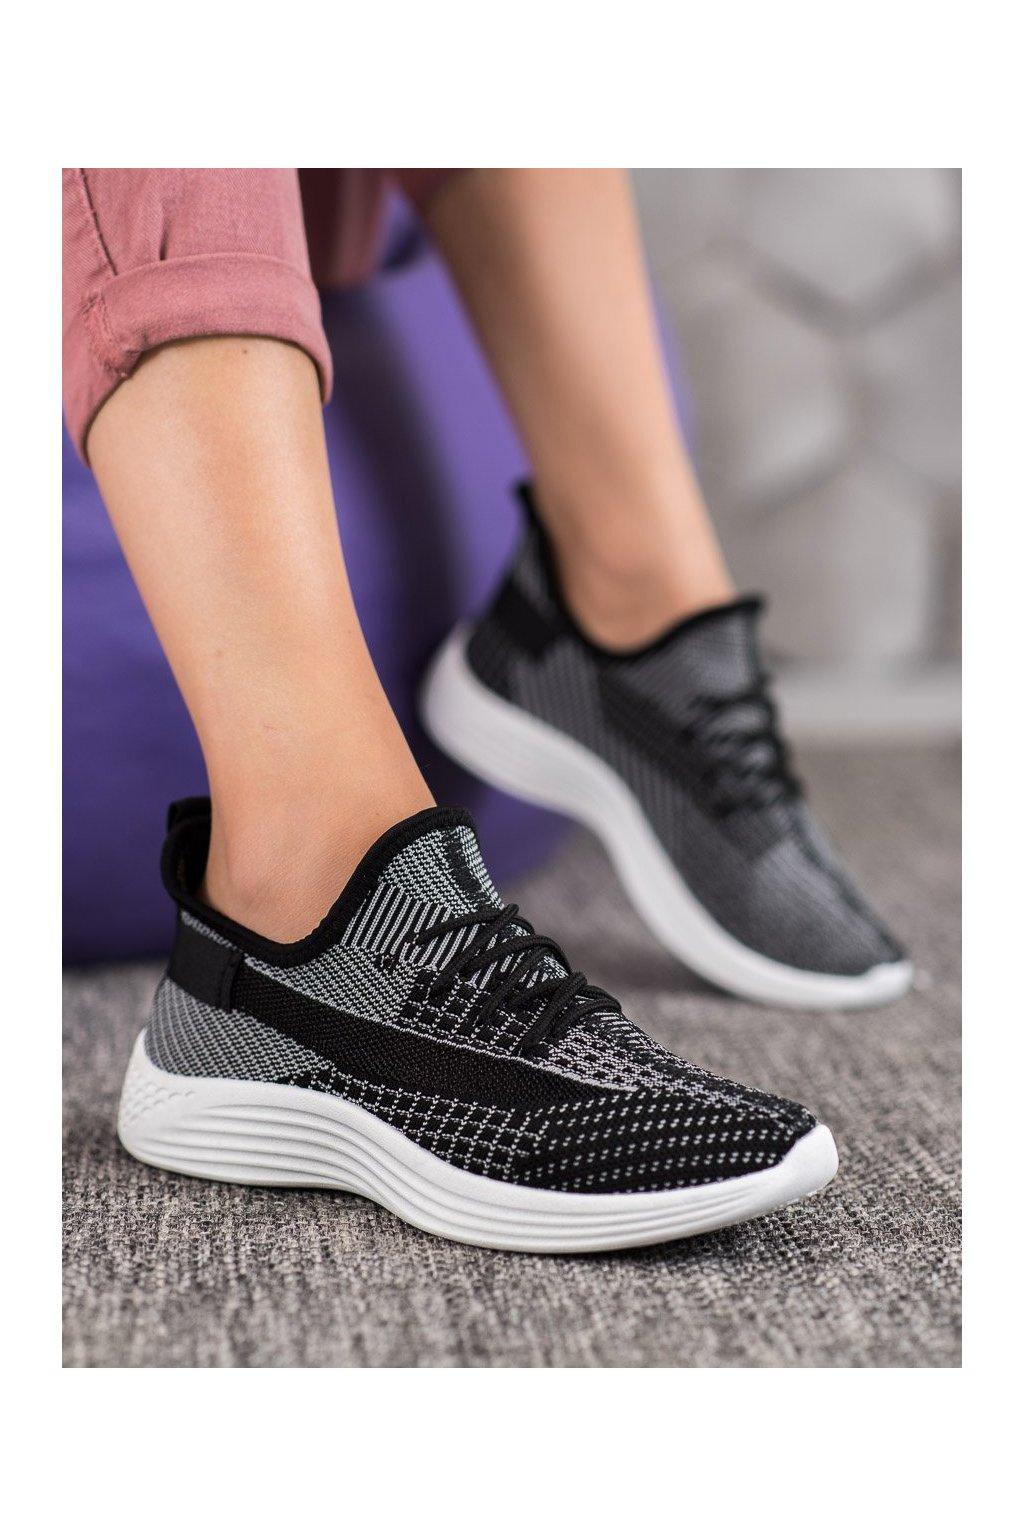 Čierne topánky Mckeylor kod ANH20-13530B